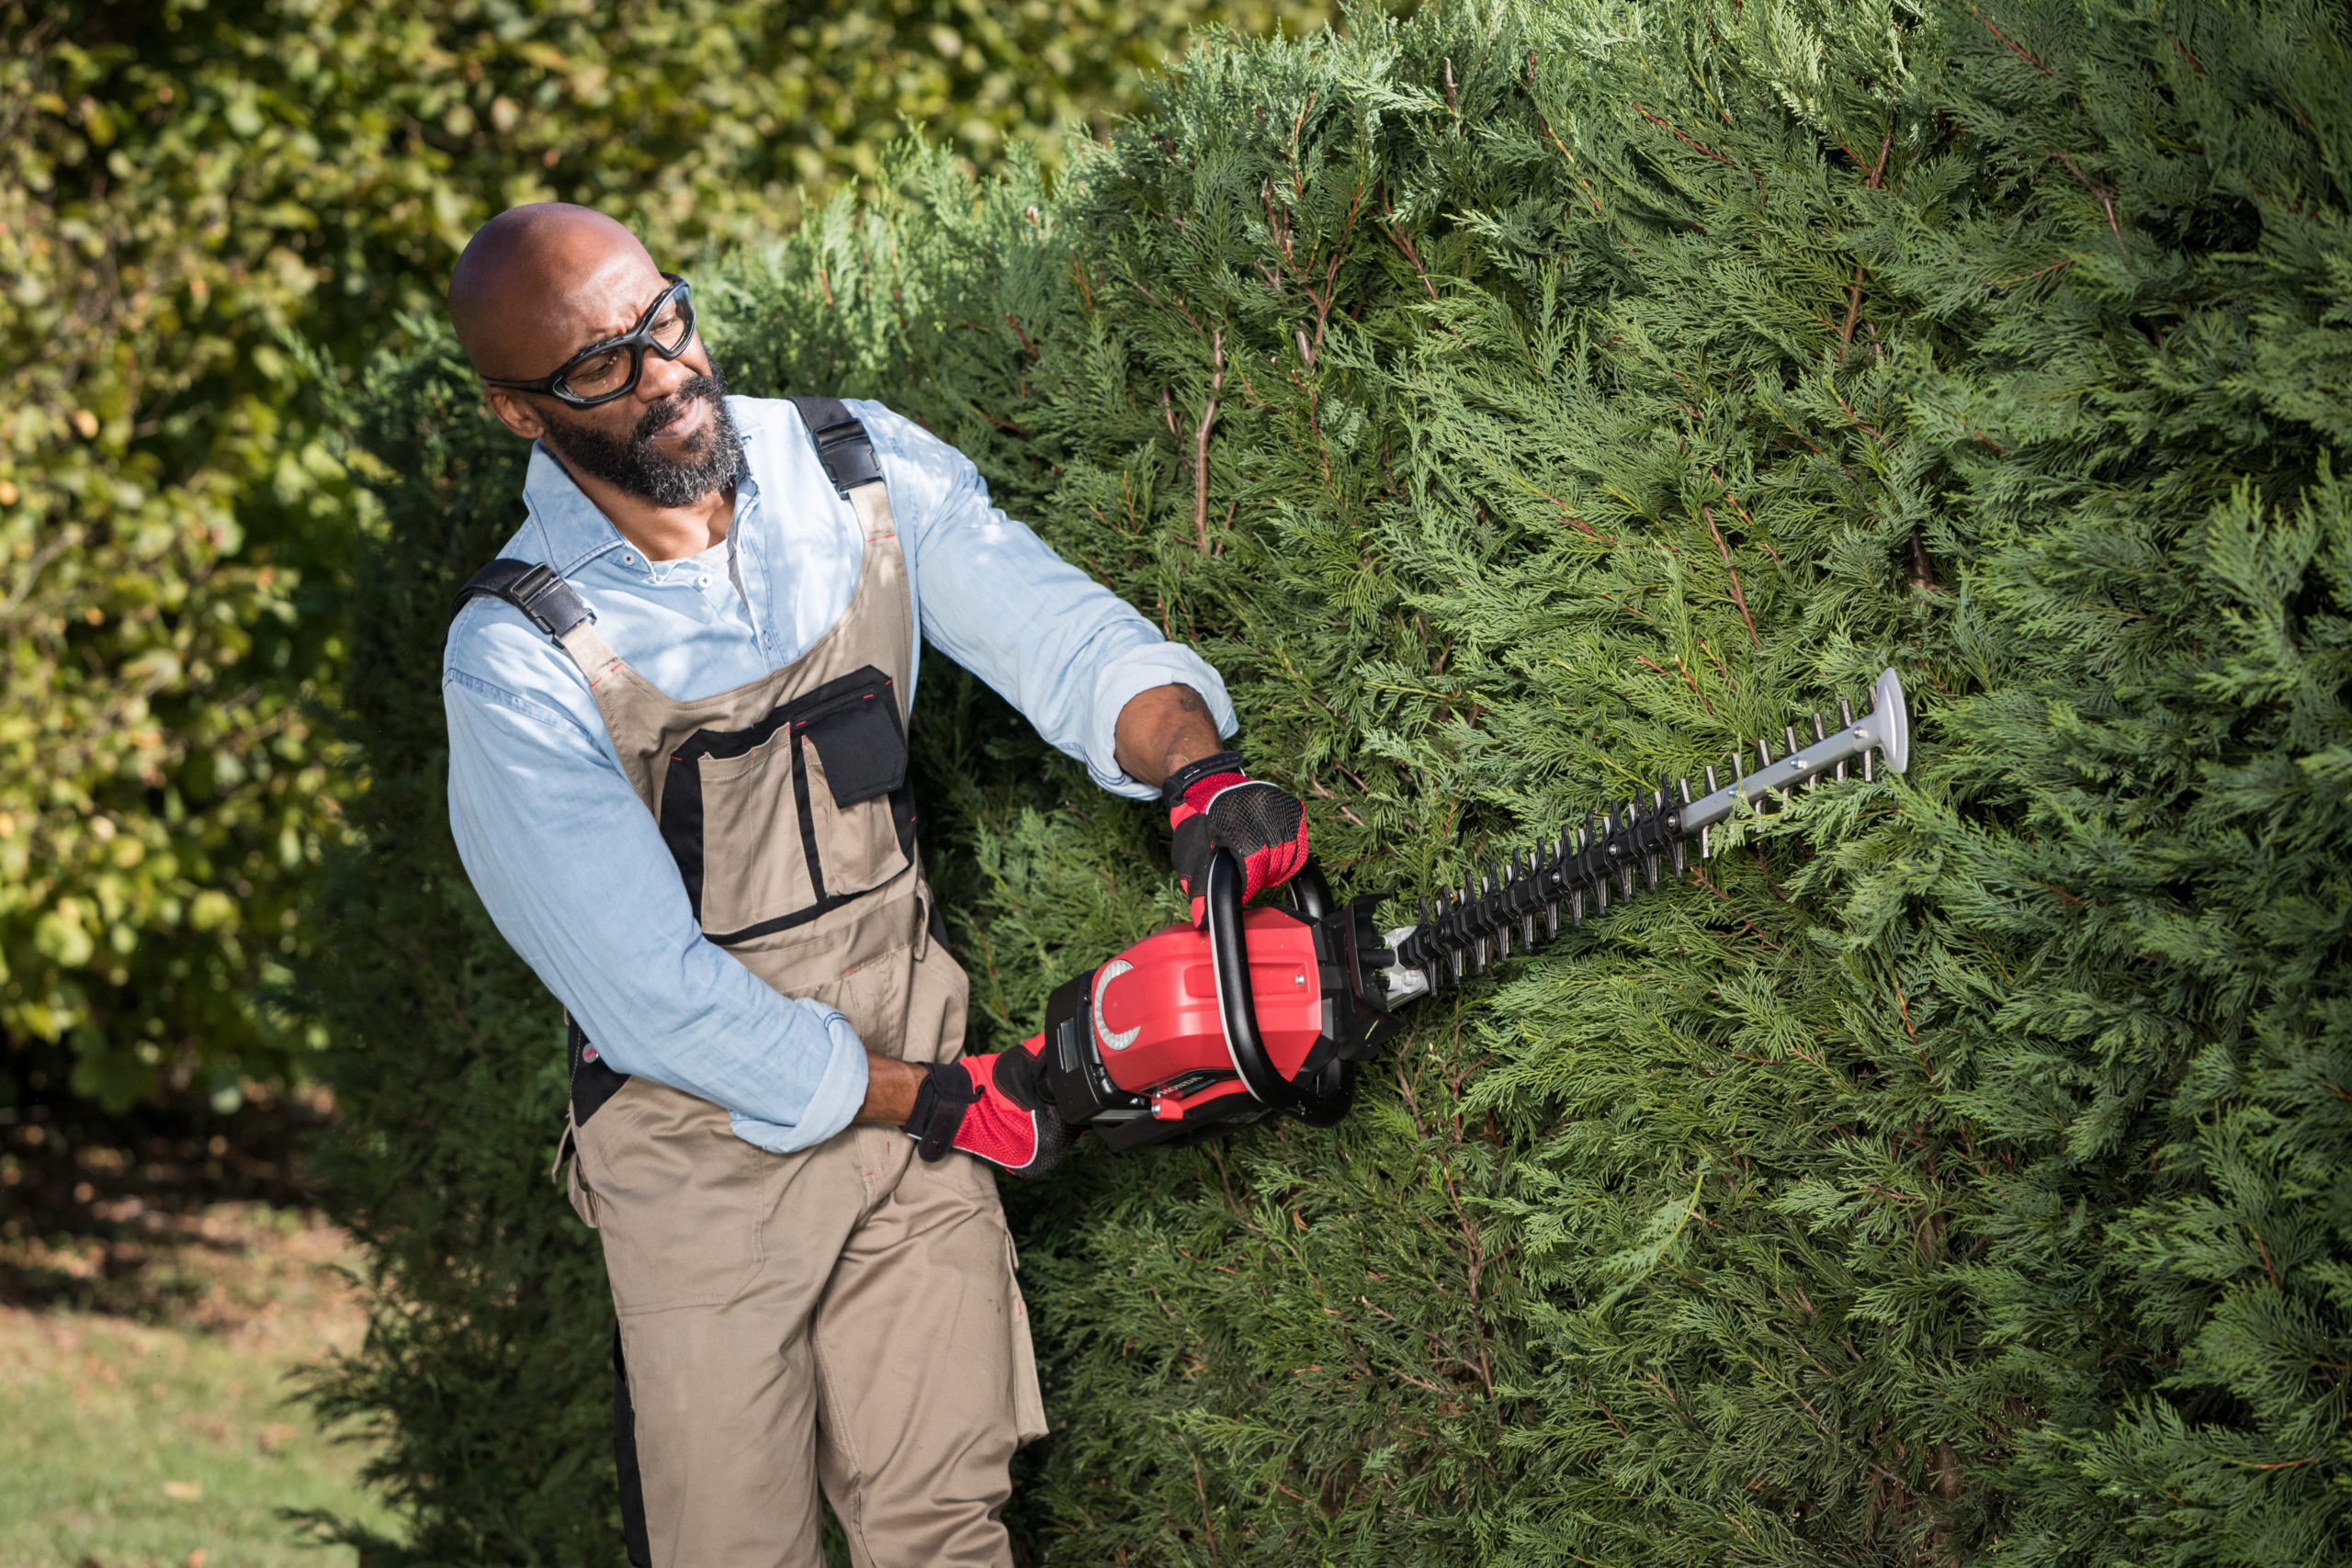 Honda hhh hedgecutter tools